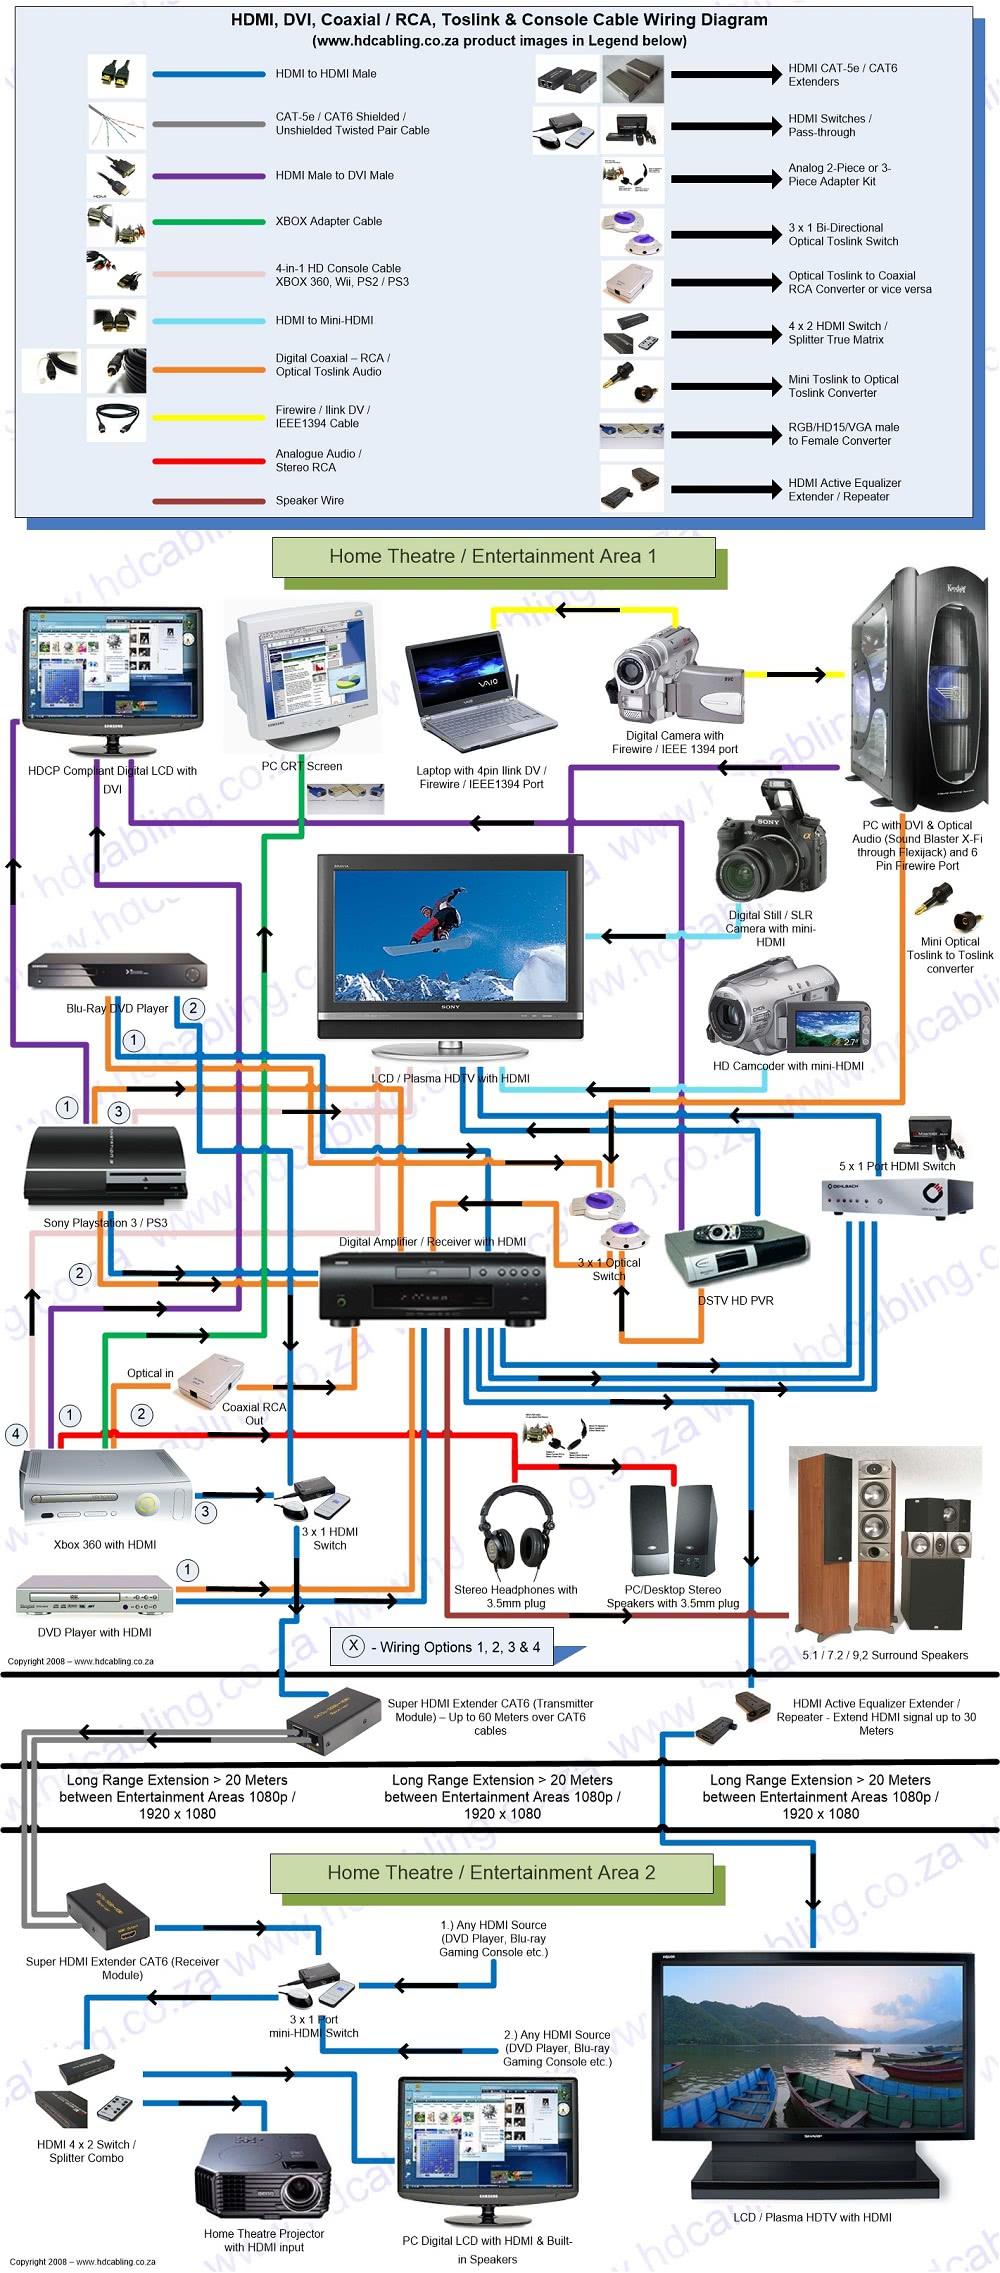 Home Entertainment Wiring Diagram - HDMI to AV, HDMI Splitter, HDMI Extender